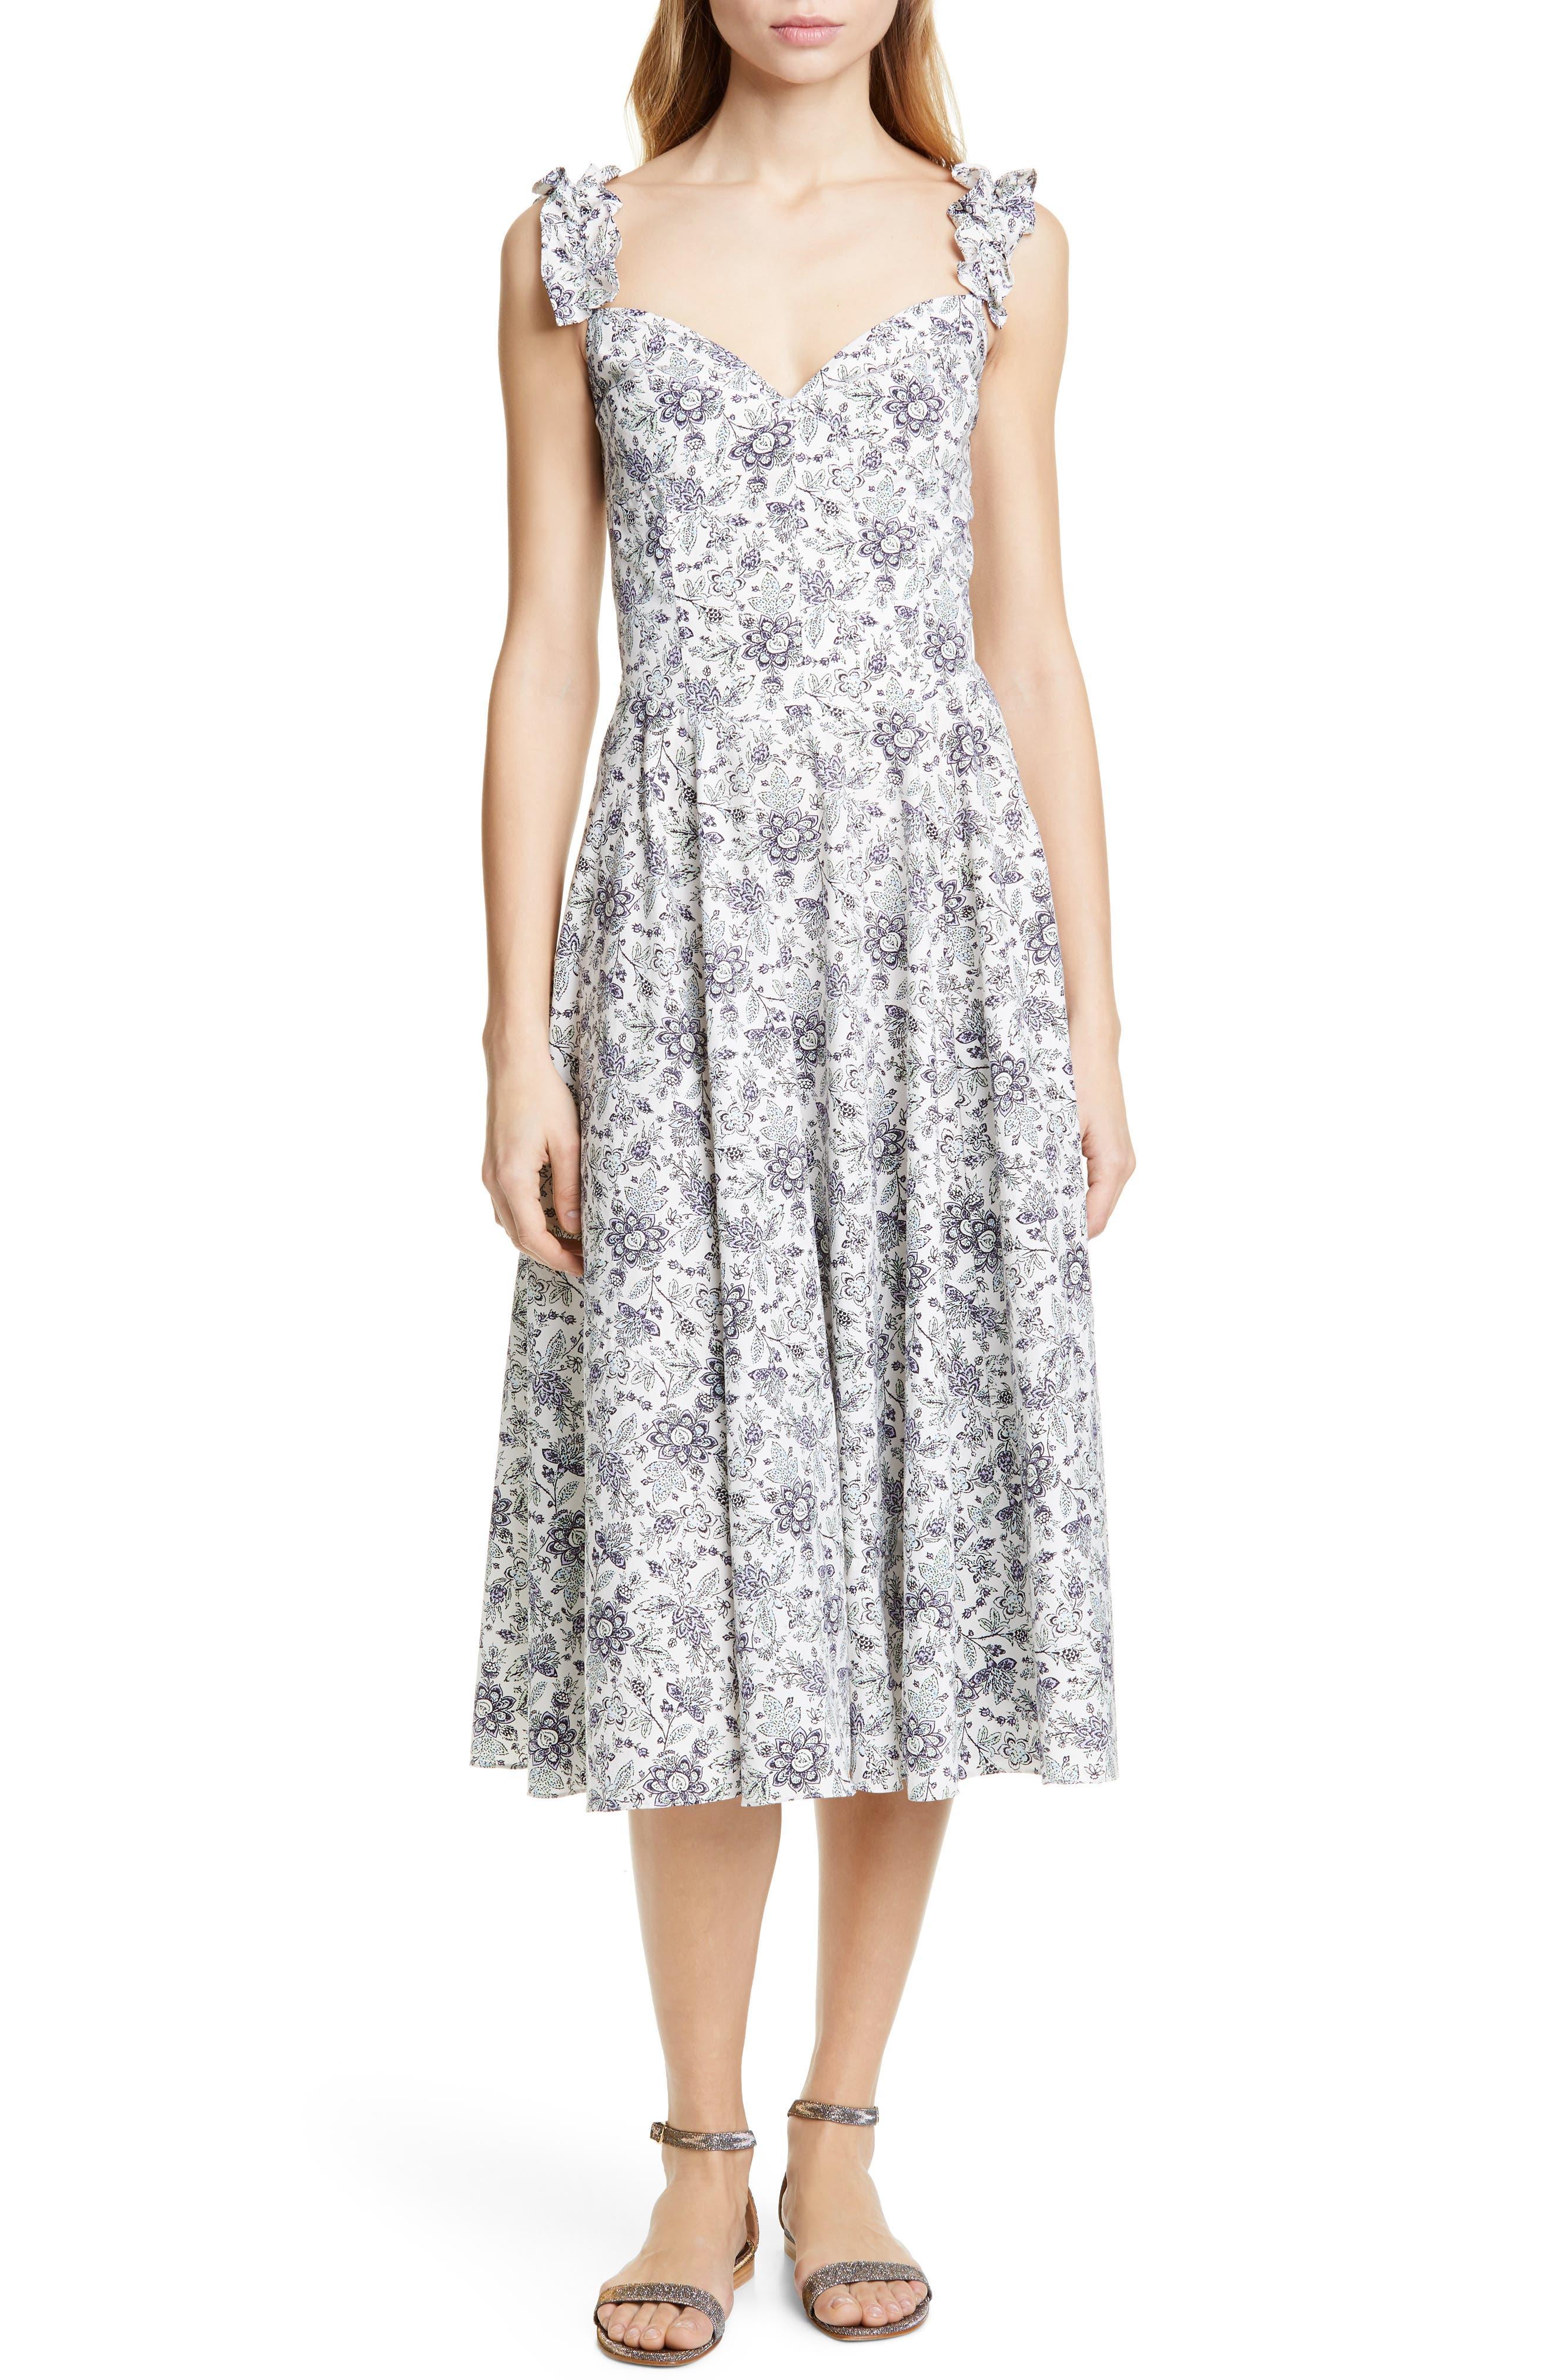 La Vie Rebecca Taylor Provencal Midi Dress, Ivory